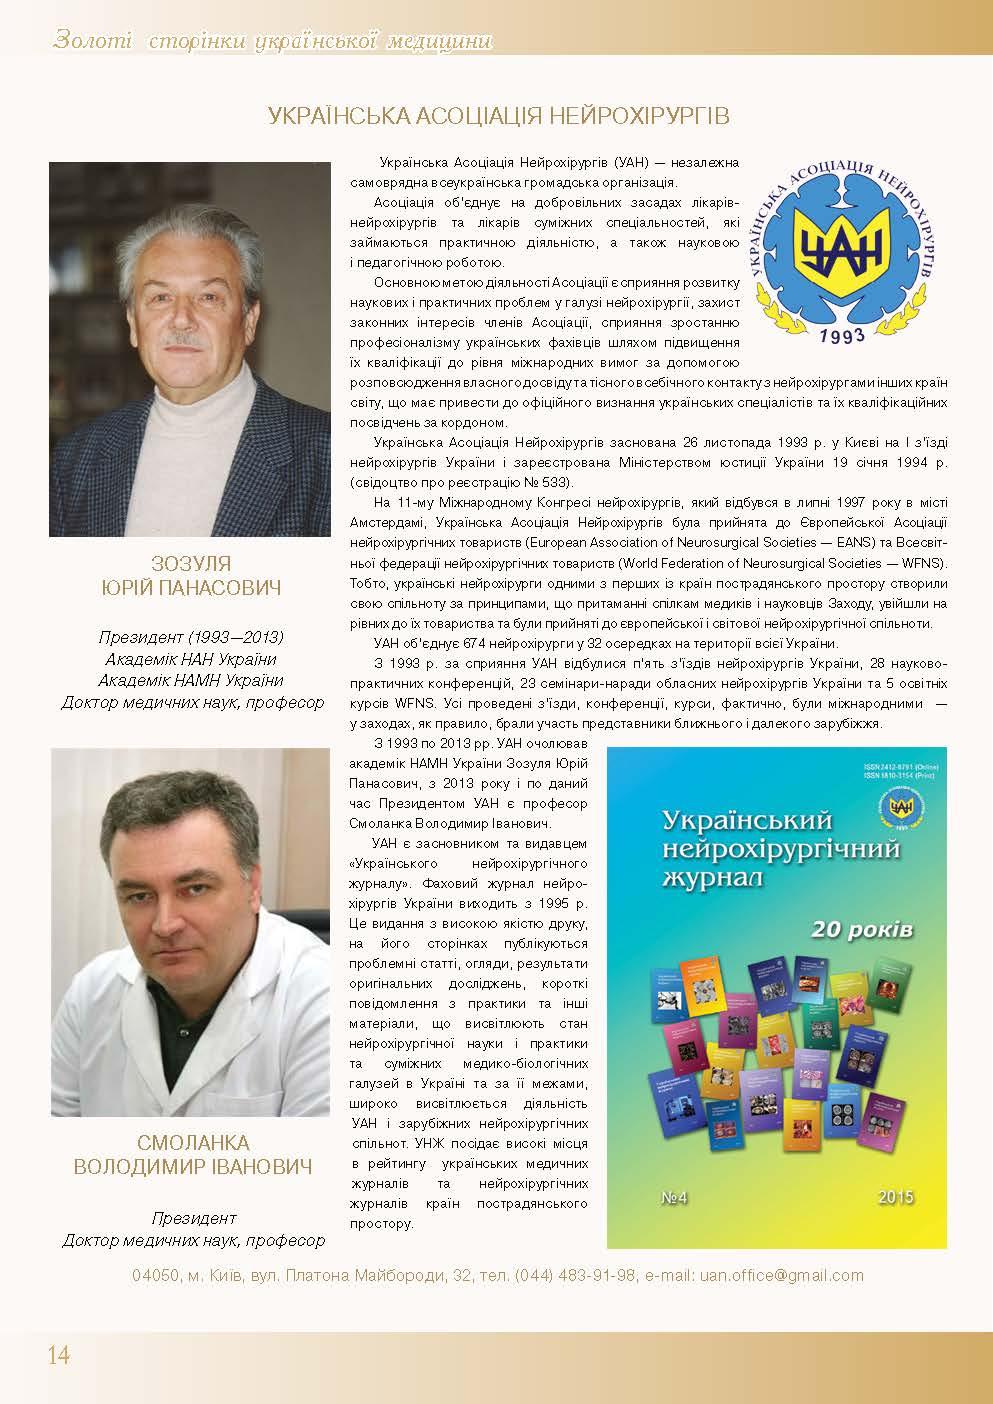 Українська Асоціація Нейрохірургів